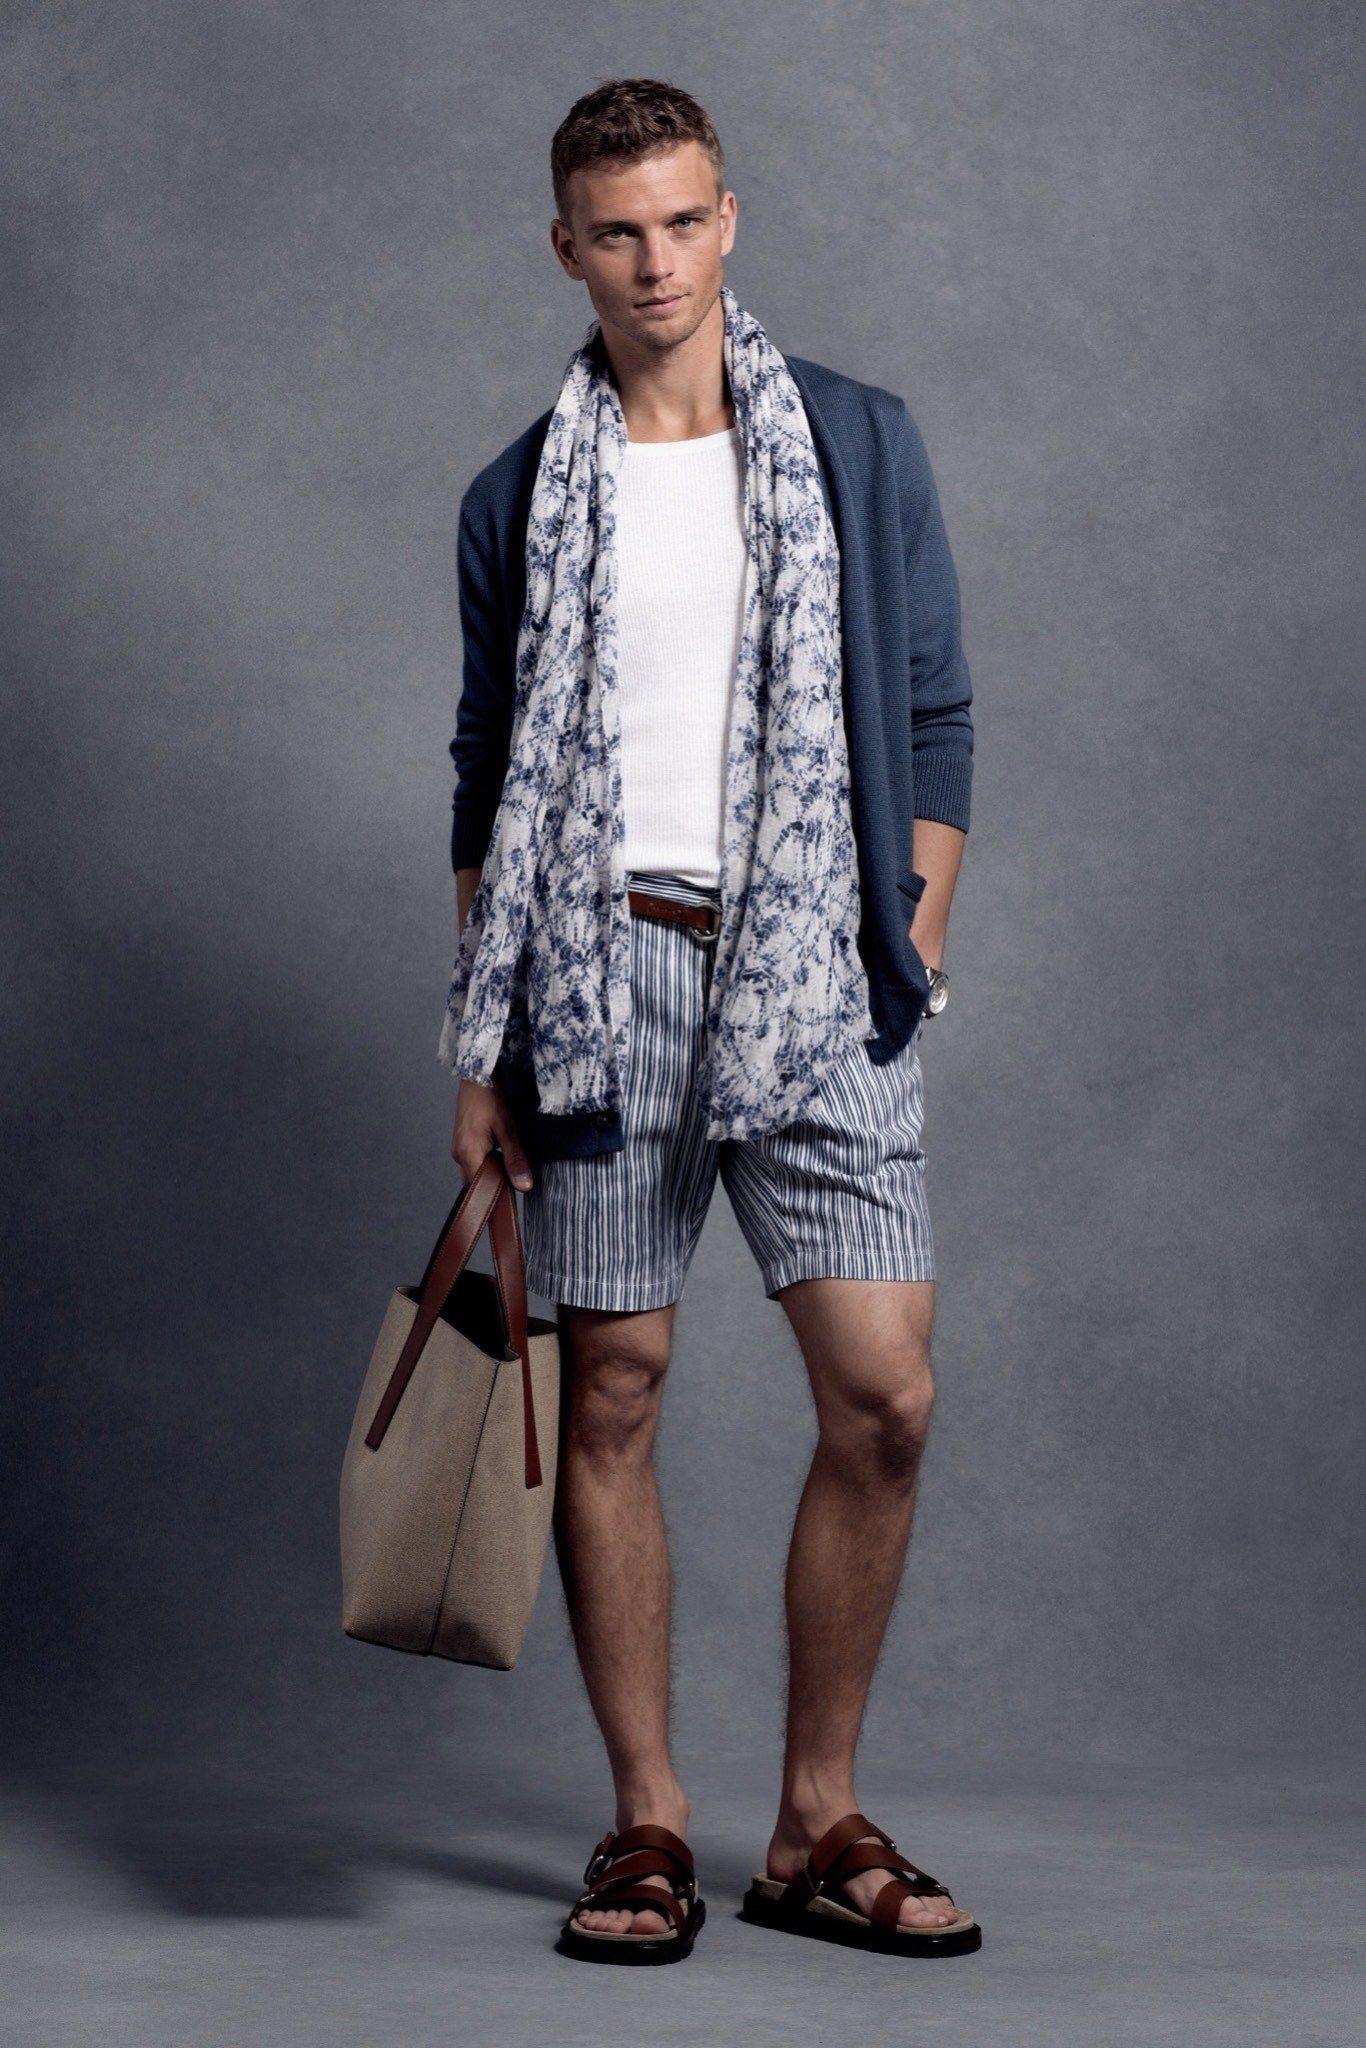 Michael Kors Collection Spring 2016 Menswear Fashion Show